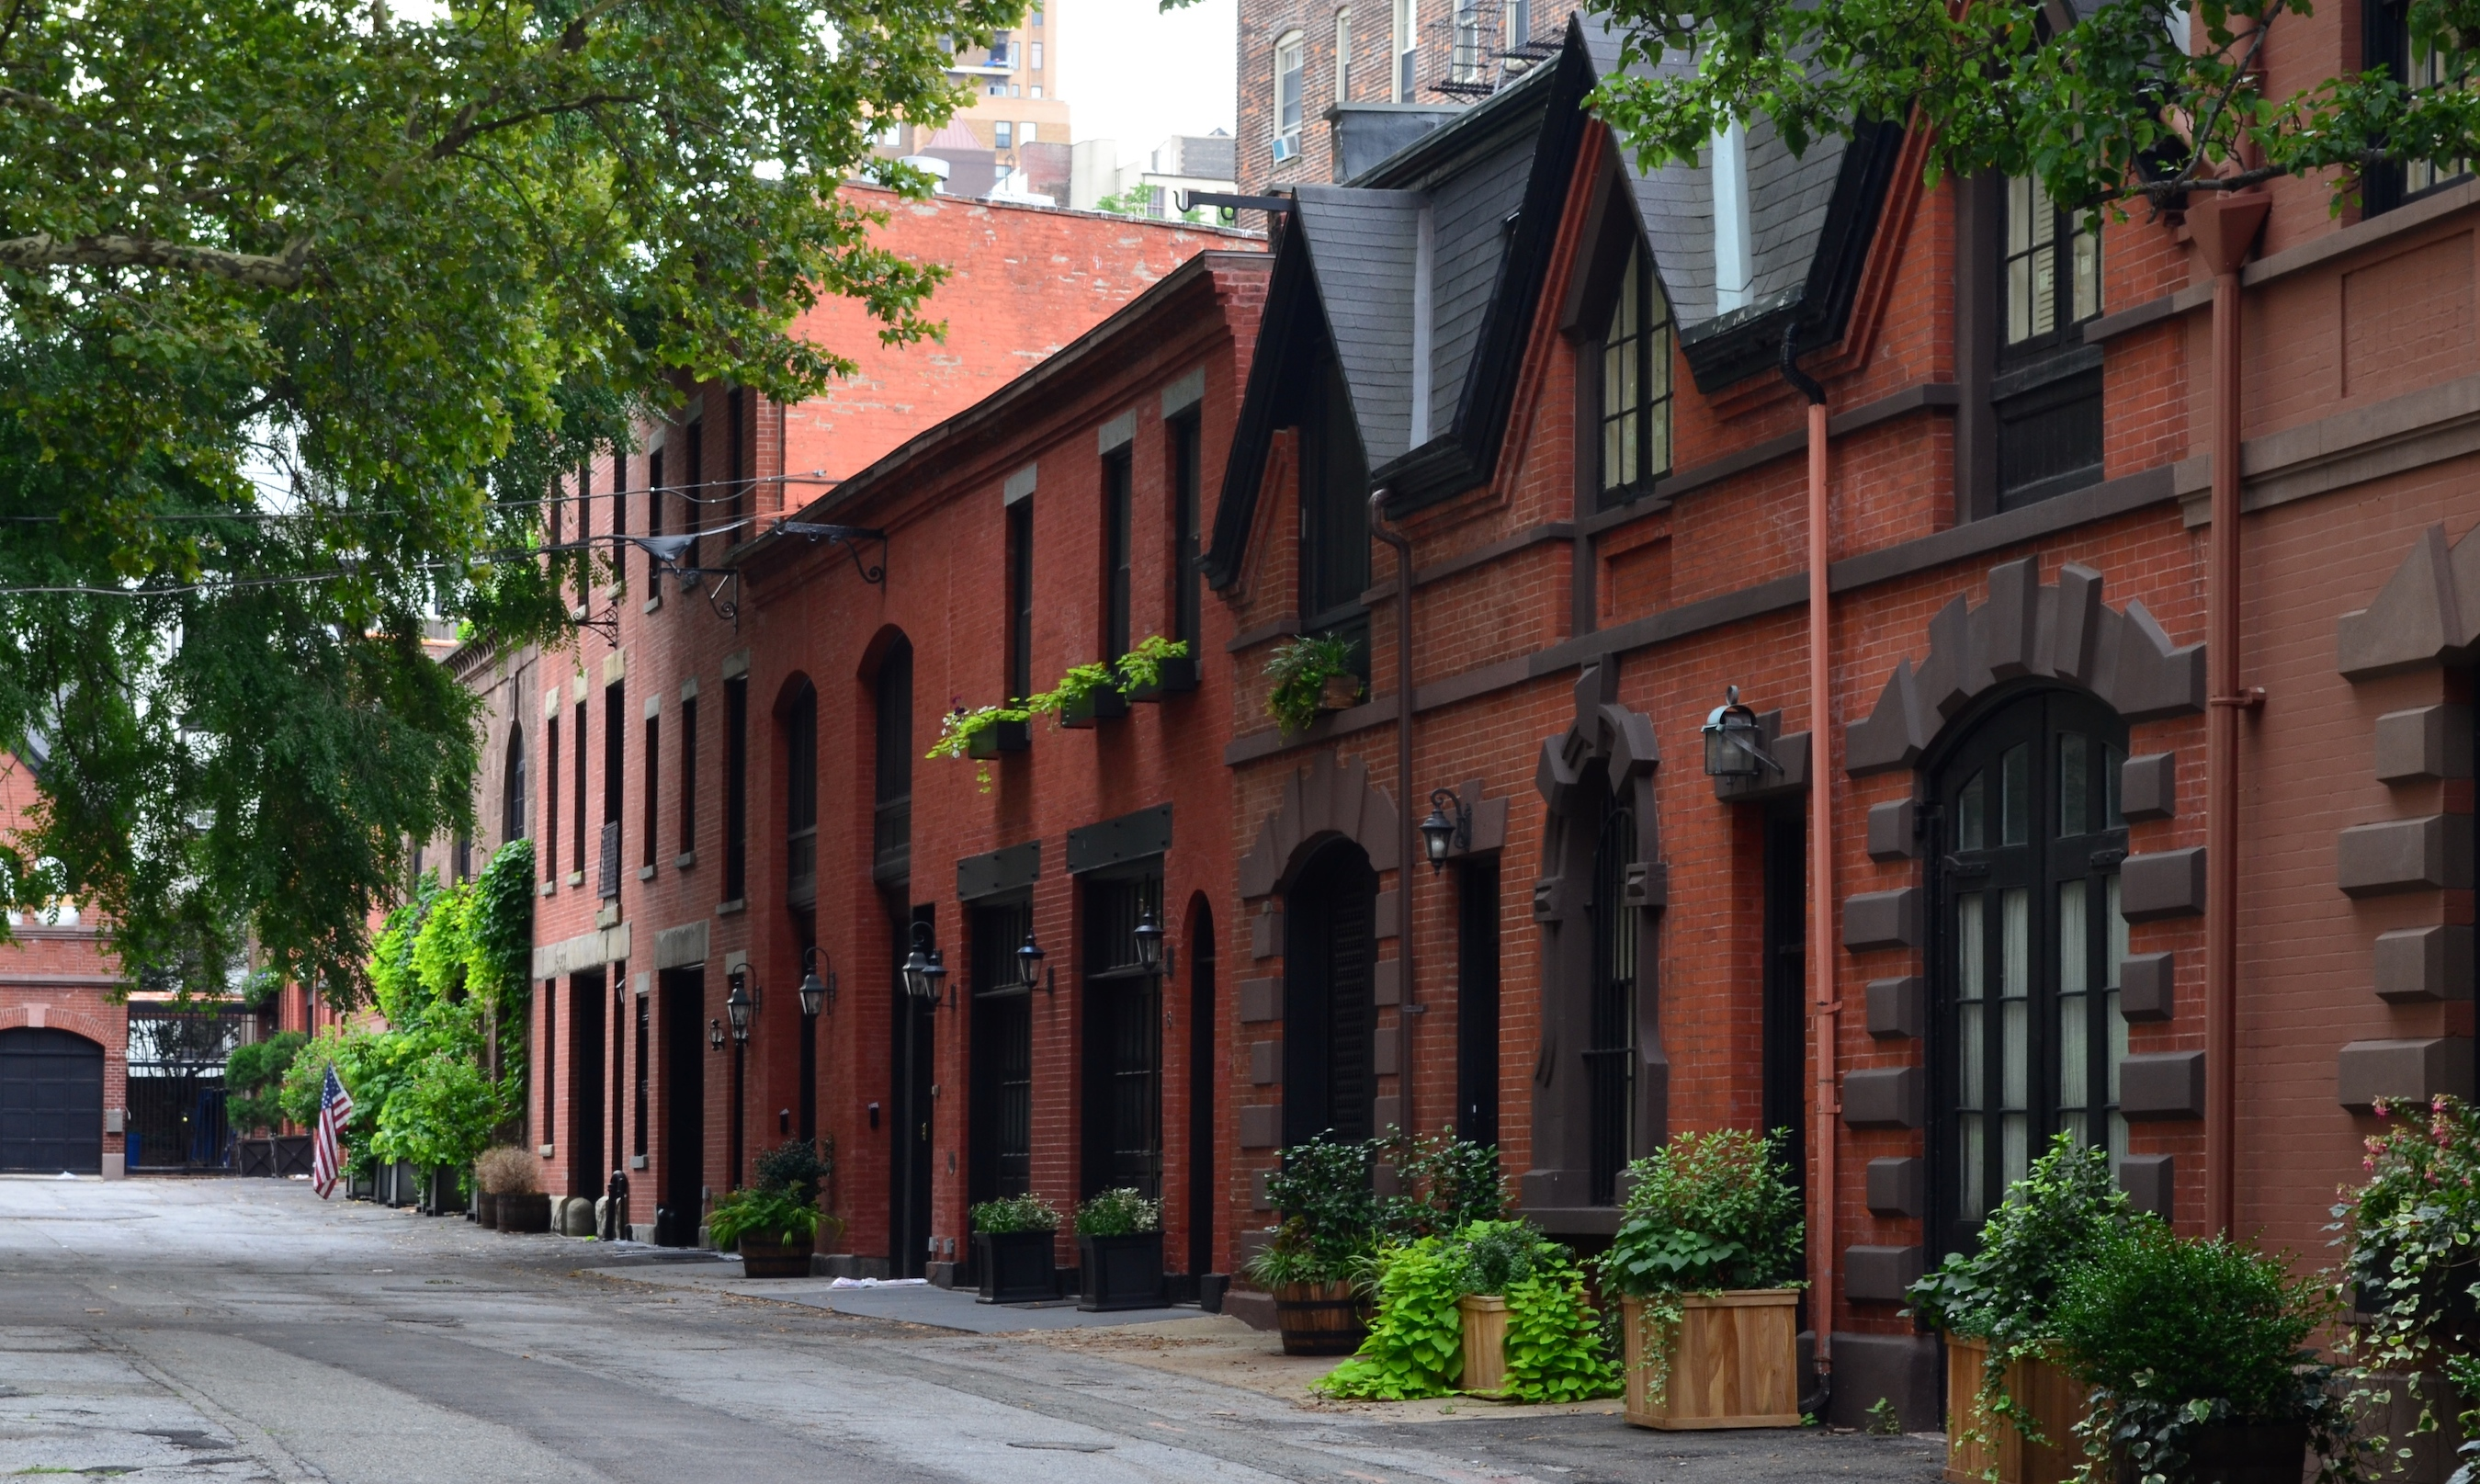 Бруклин улицы фото